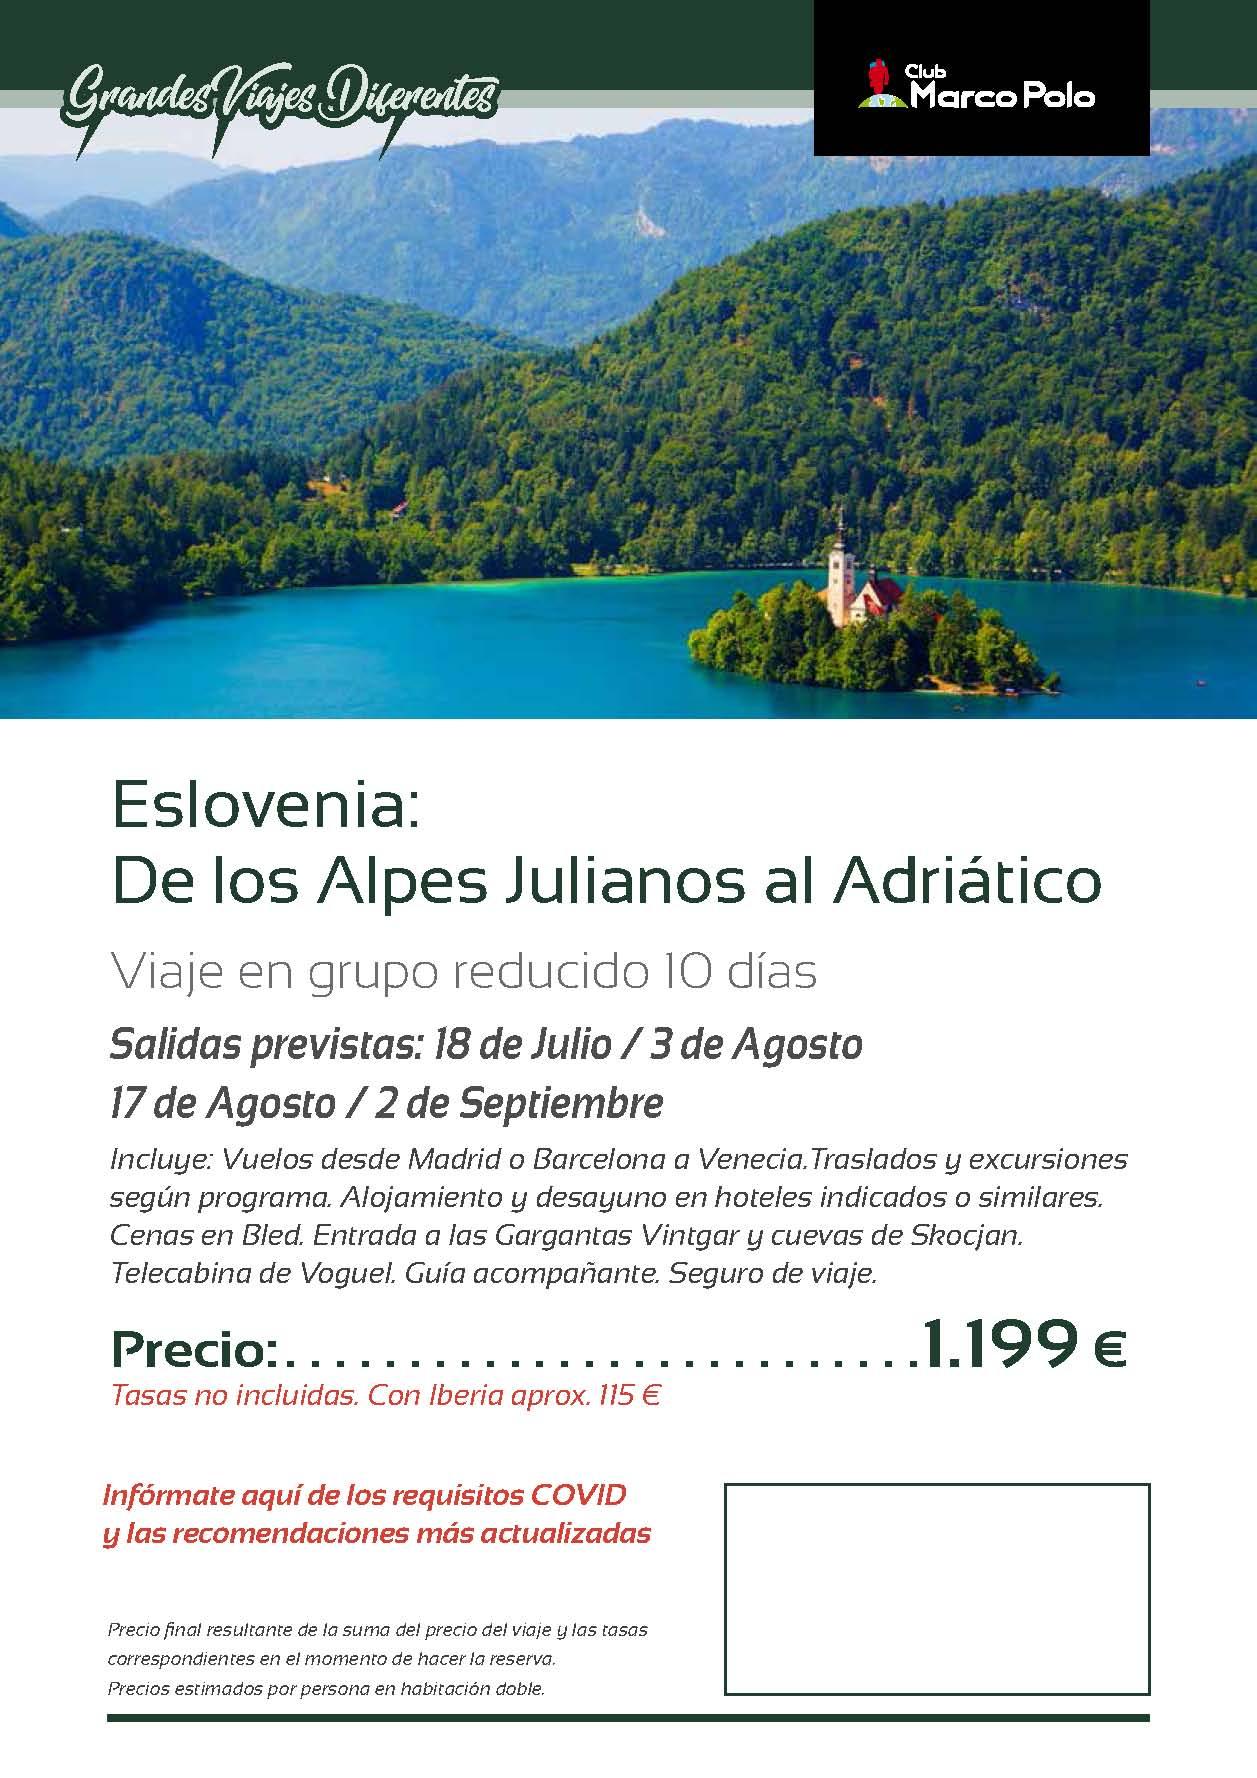 Oferta Club Marco Polo viaje a Eslovenia Julio Agosto y Septiembre 2021